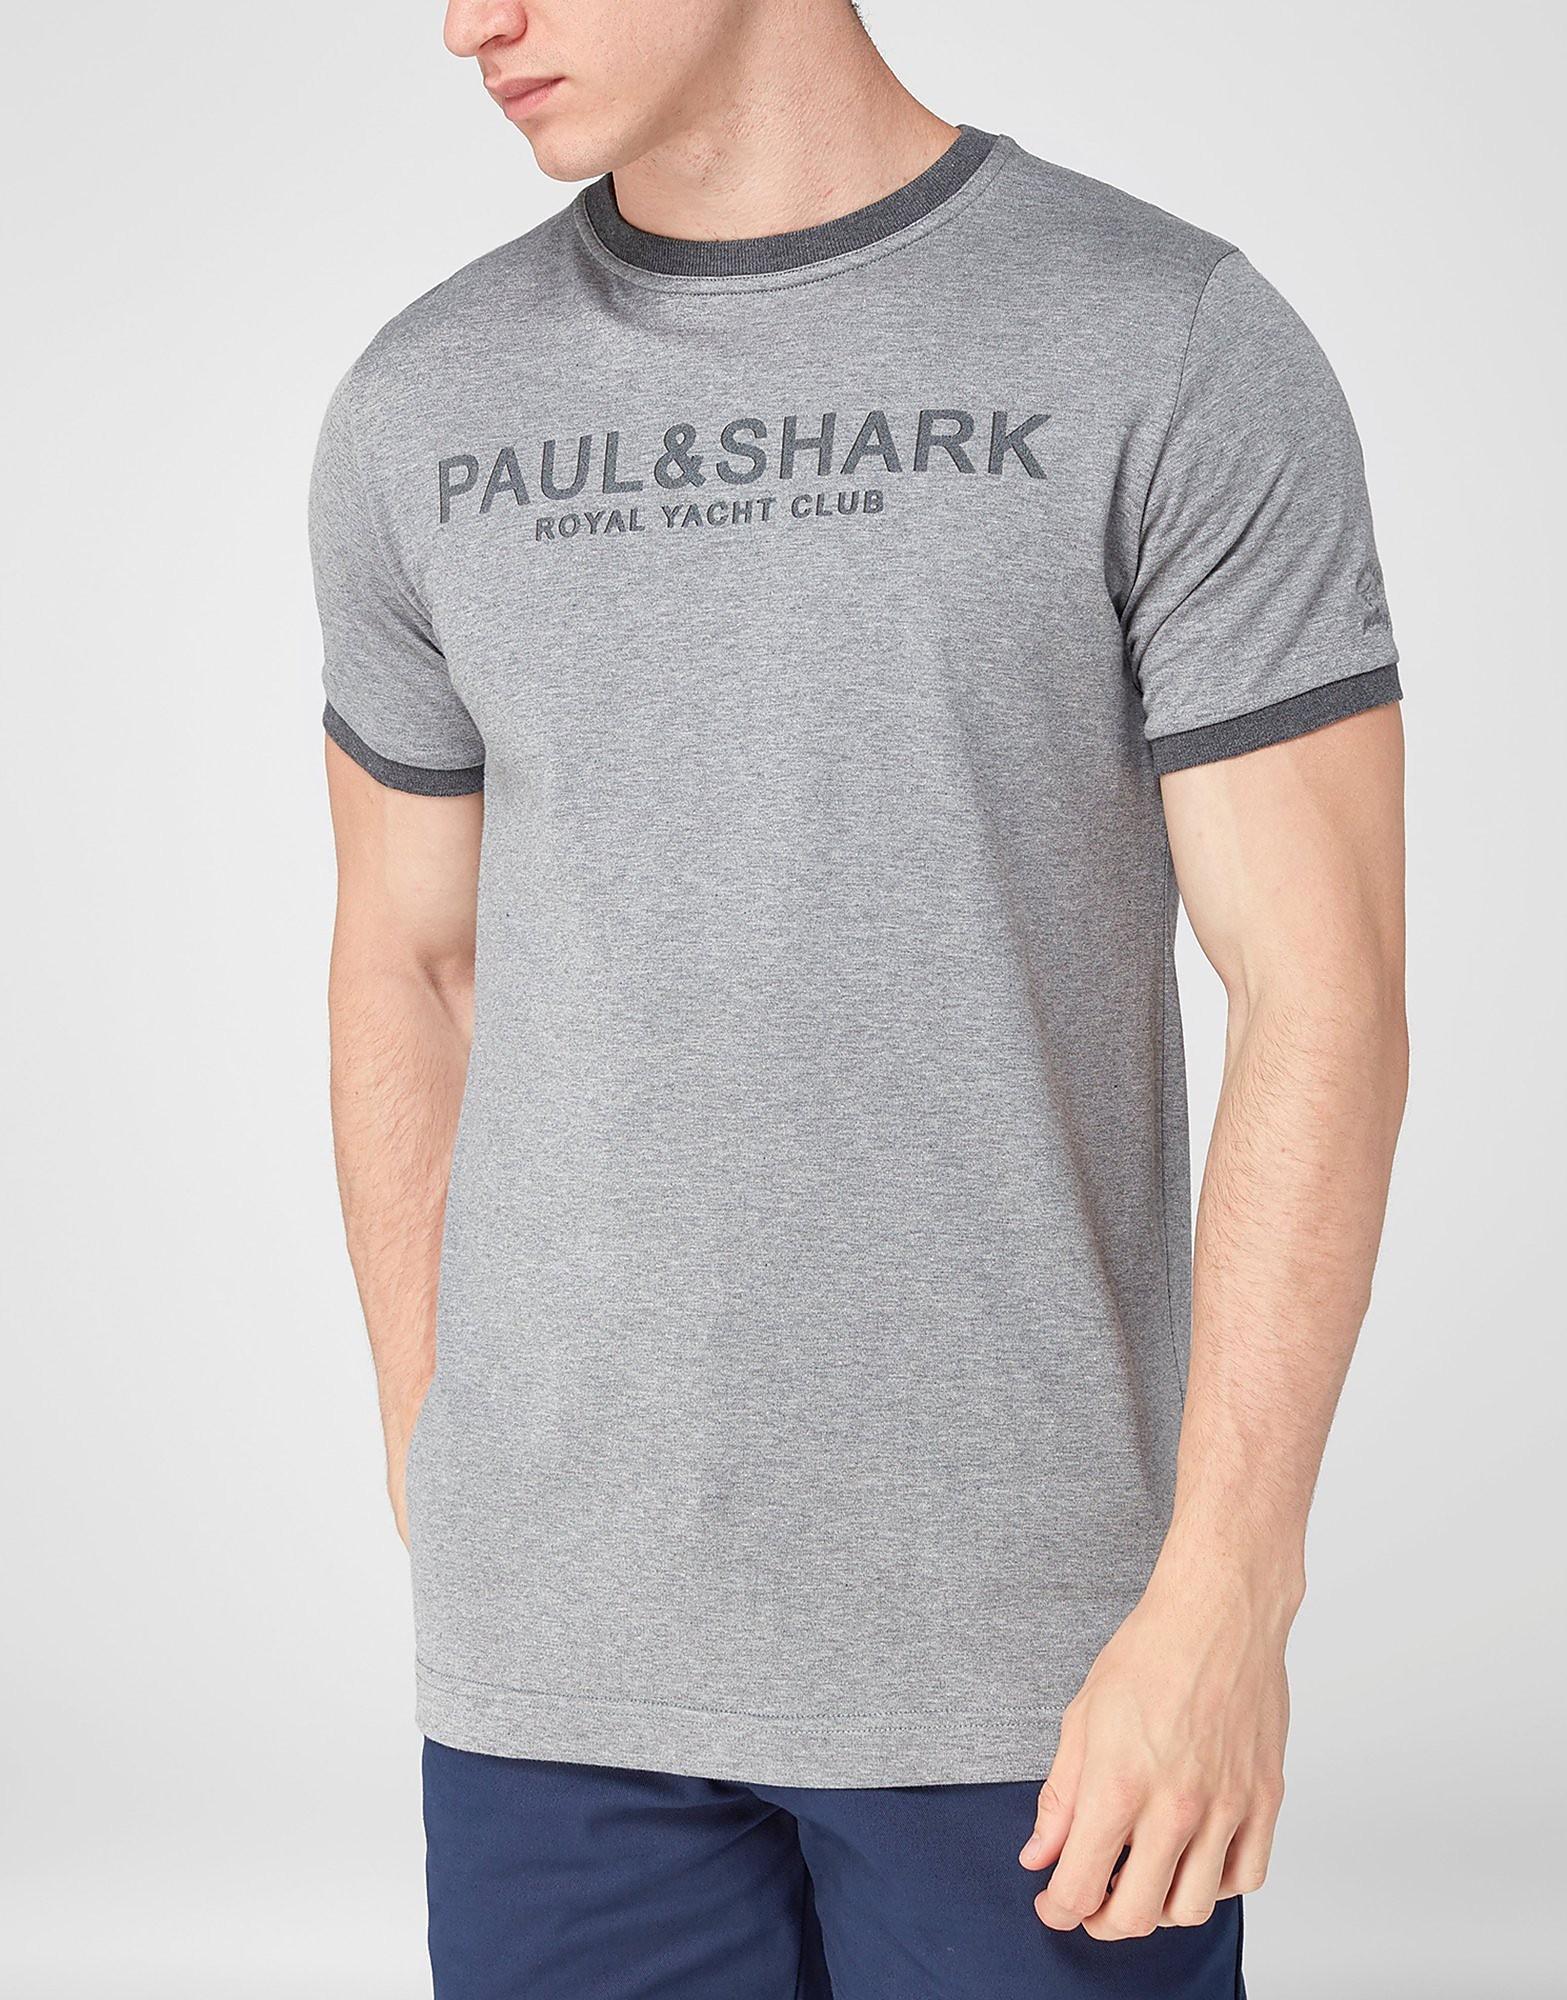 Paul and Shark Premium Crew T-Shirt